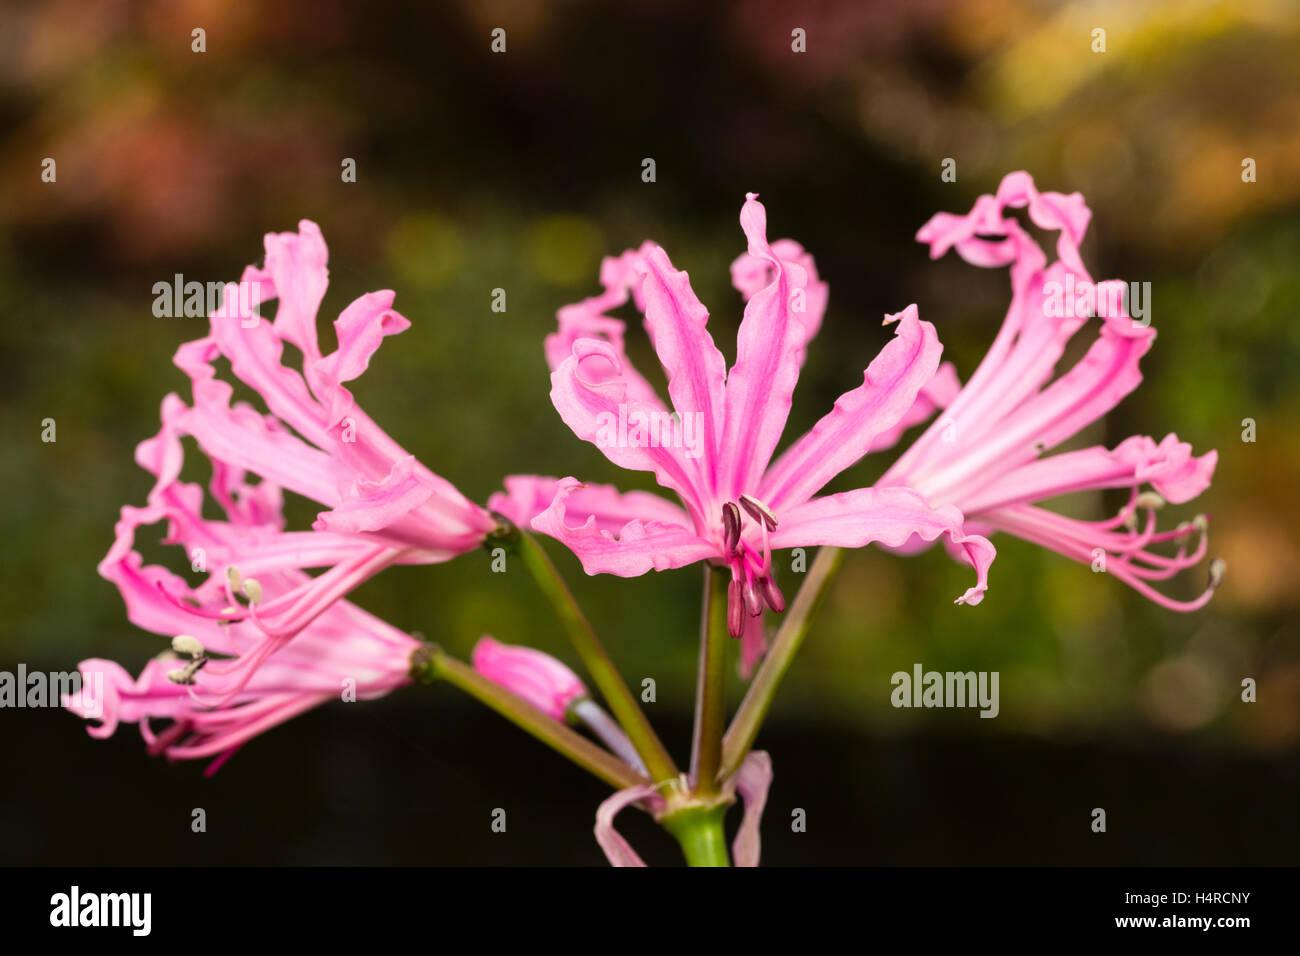 Undulate pink petals and strong growth distinguish the autumn stock undulate pink petals and strong growth distinguish the autumn flowering bulb nerine bowdenii mark fenwick fenwicks variety mightylinksfo